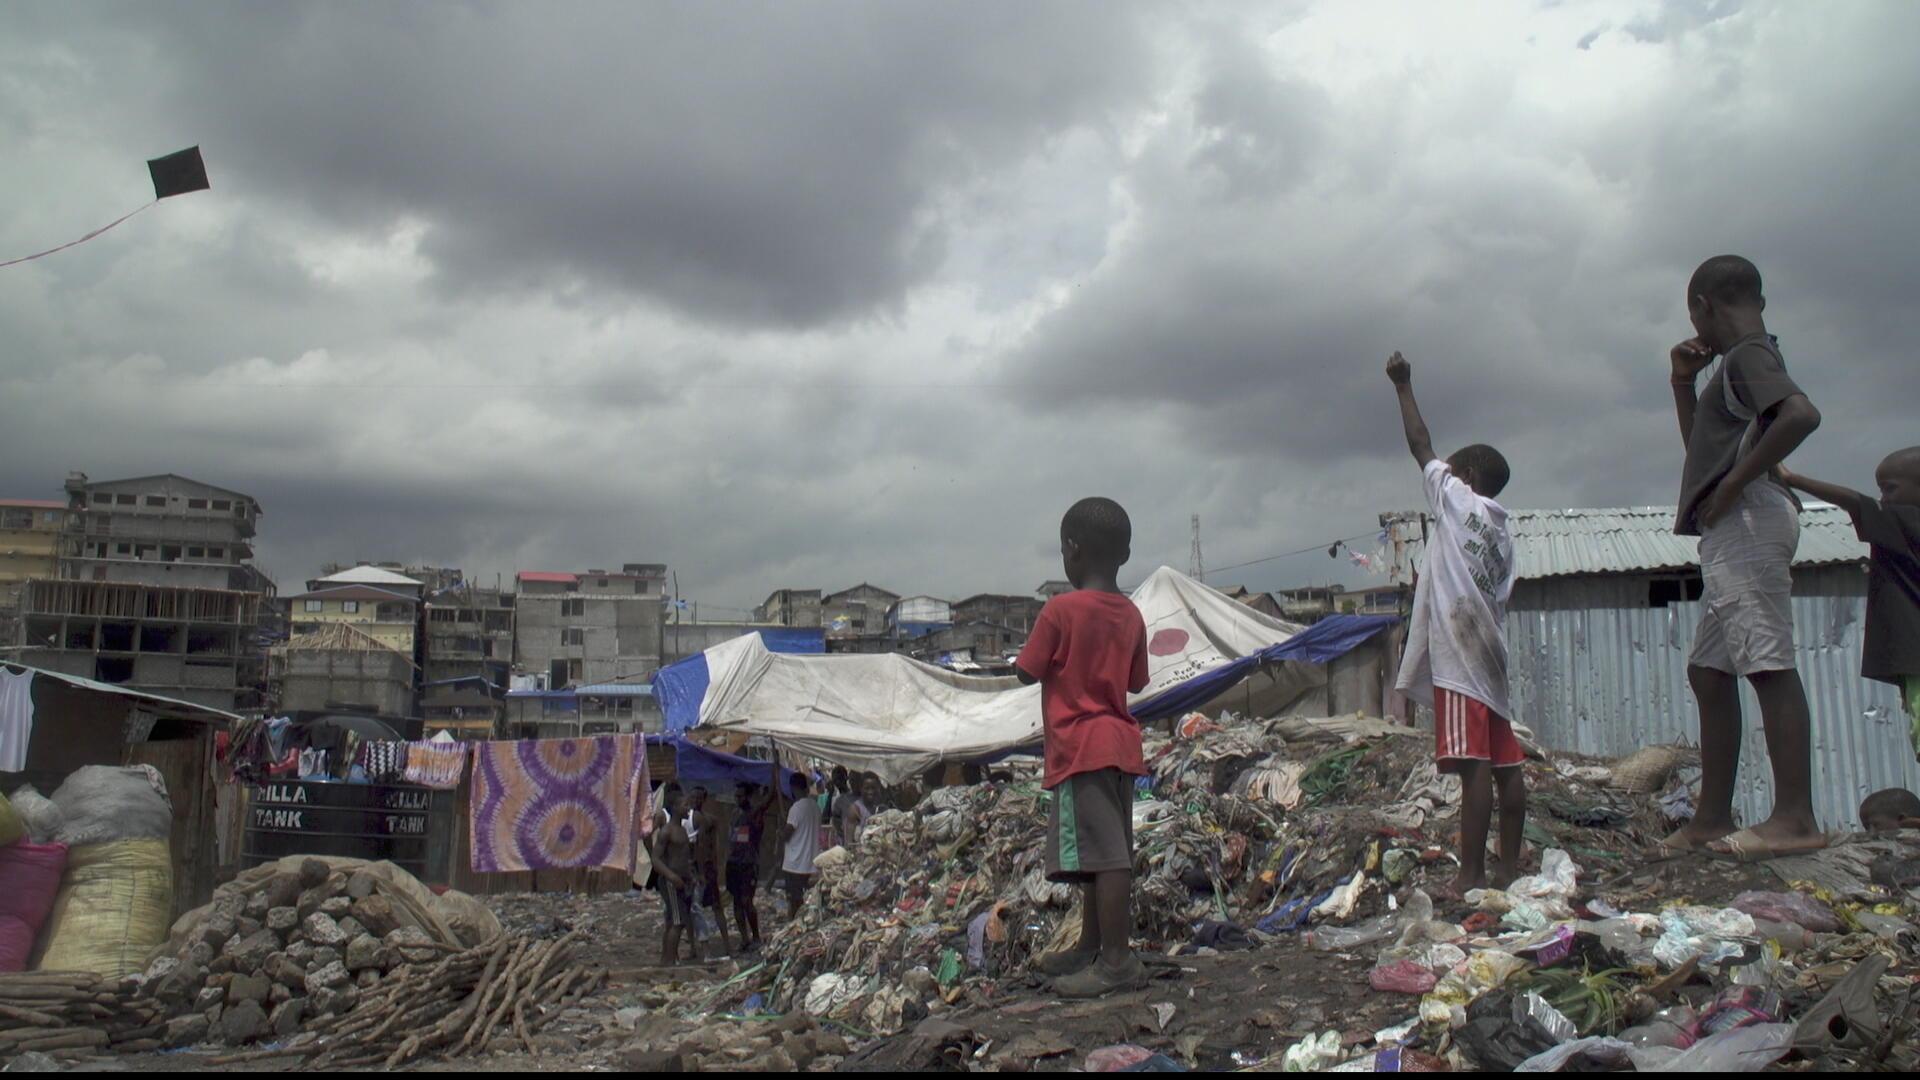 FR BILLET RETOUR SIERRA LEONE NO MIX_frame_8316